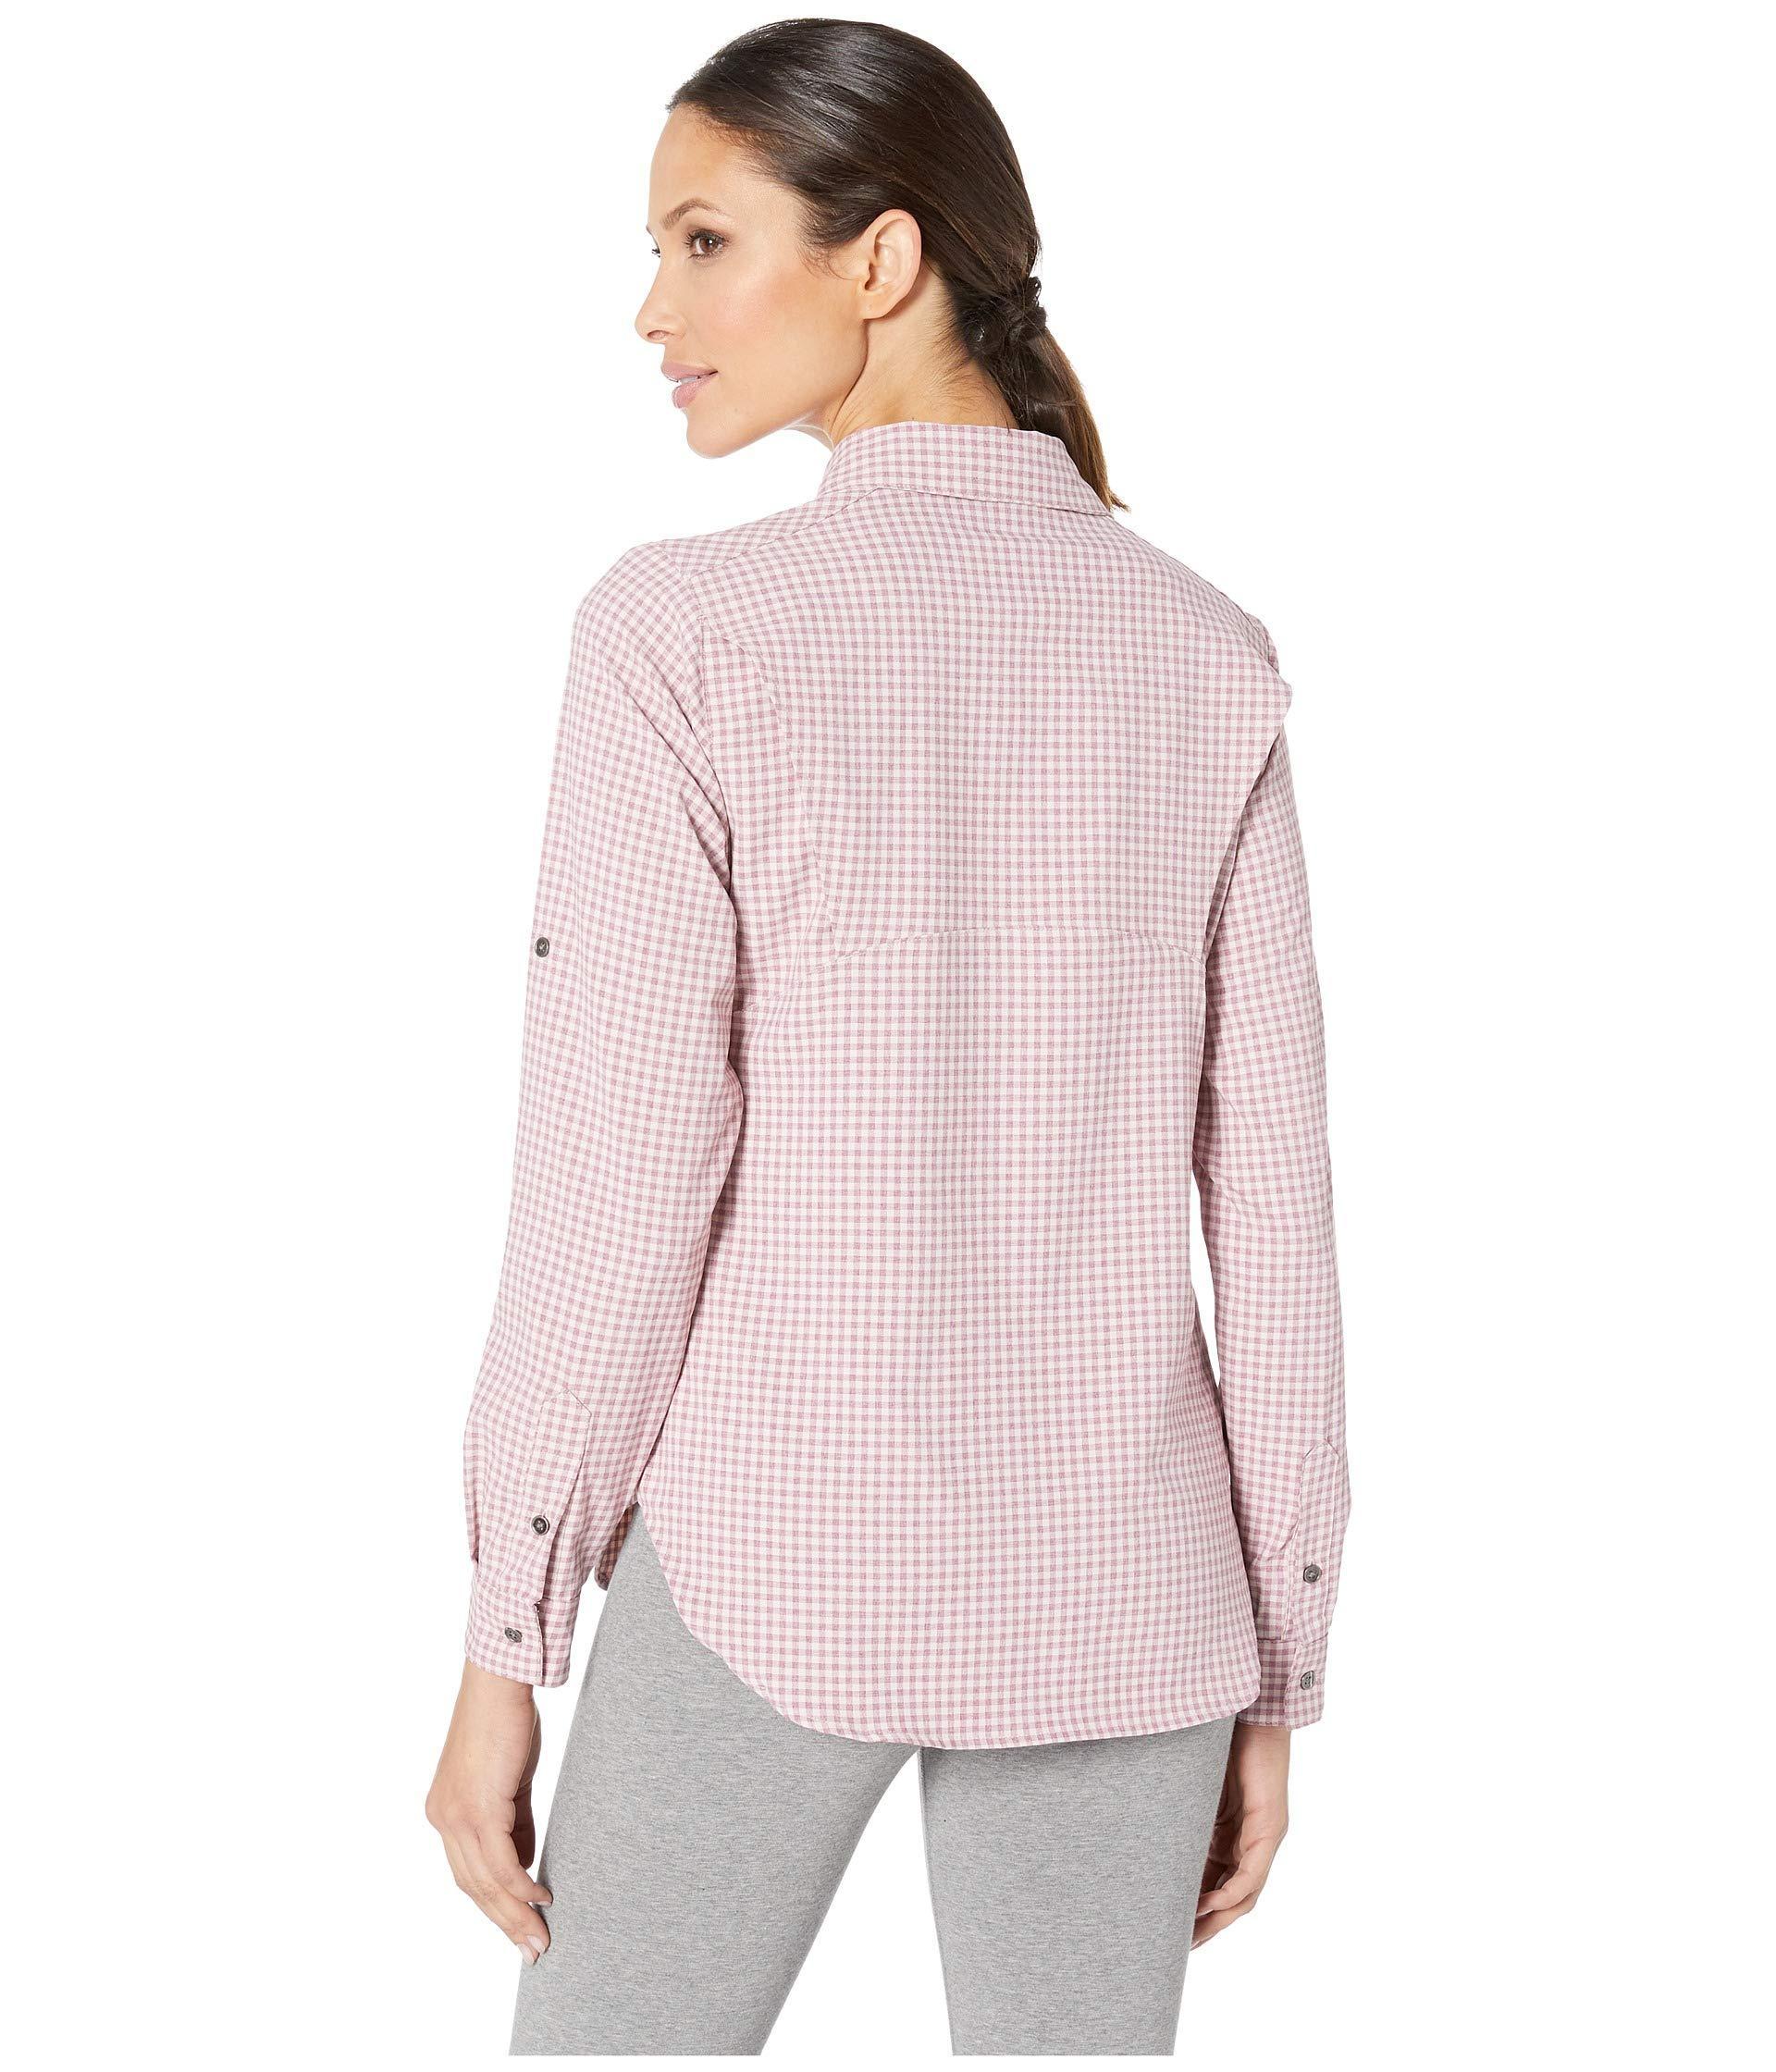 d2b7bc38 ... Bryce Canyon Stretch Long Sleeve Shirt (antique Mauve Gingham) Women's  Long. View fullscreen